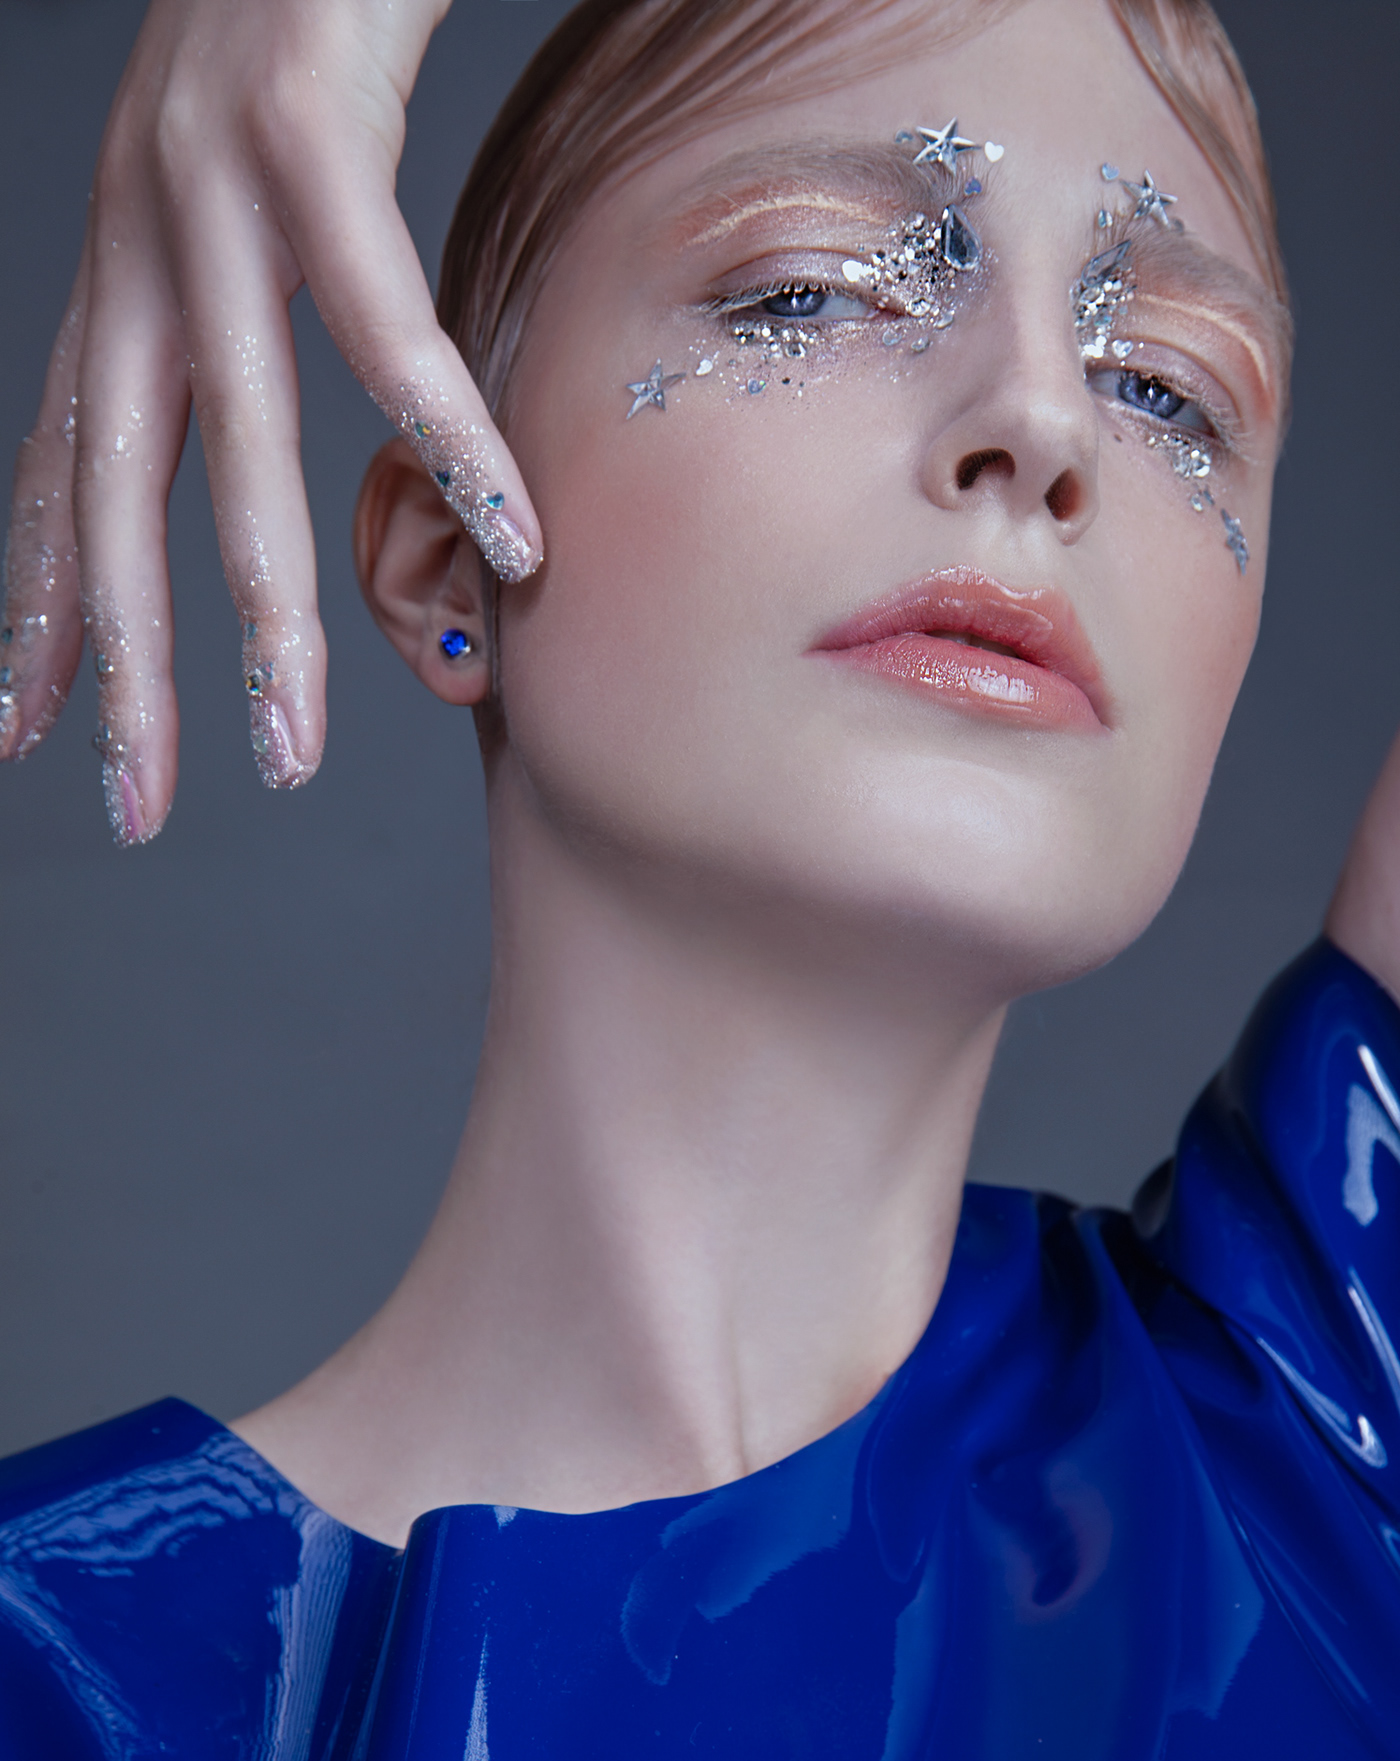 Image may contain: person, fashion accessory and lipstick